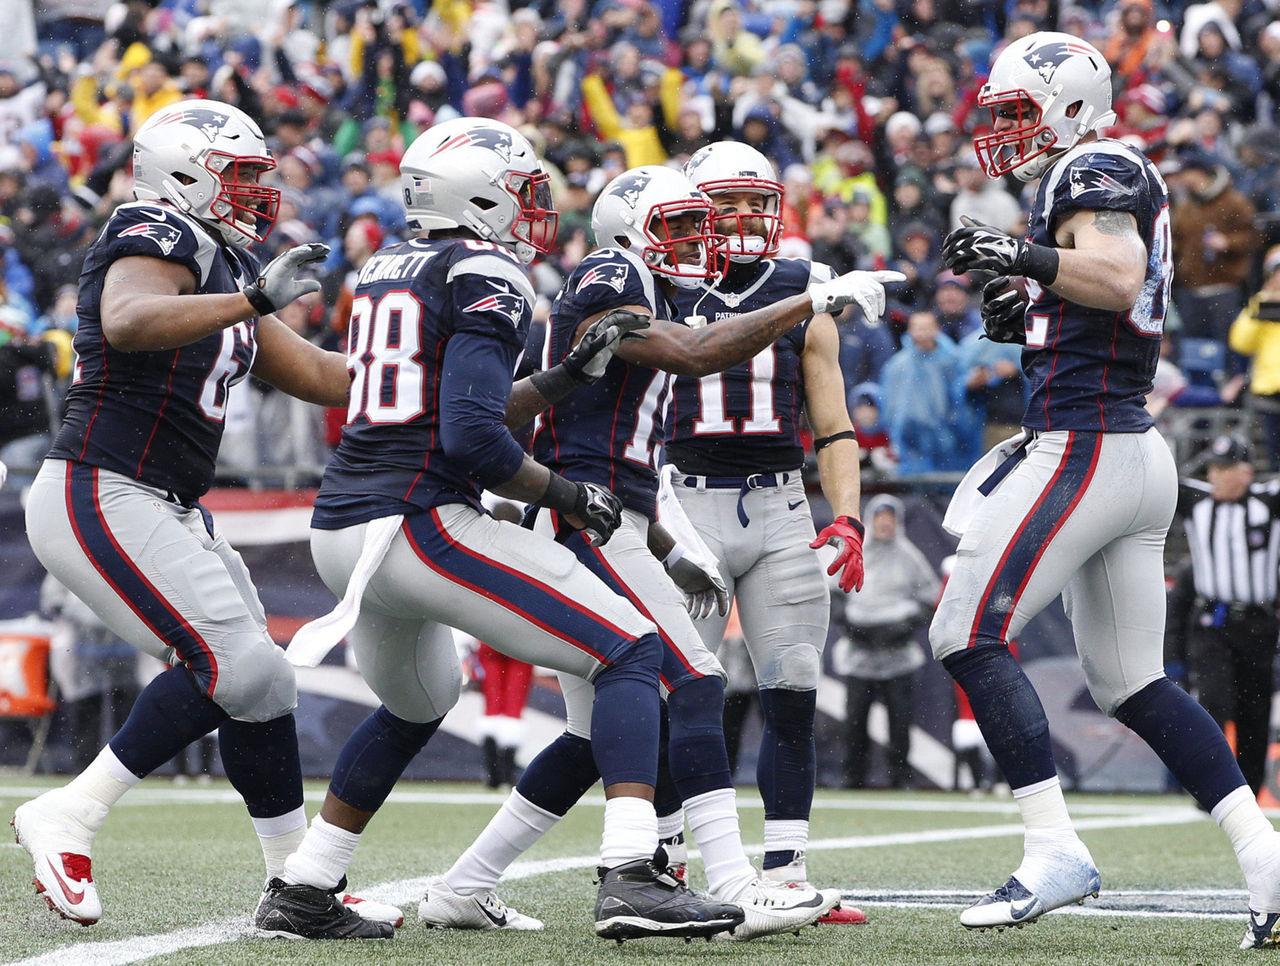 5 under-the-radar players who will help determine Super Bowl LI